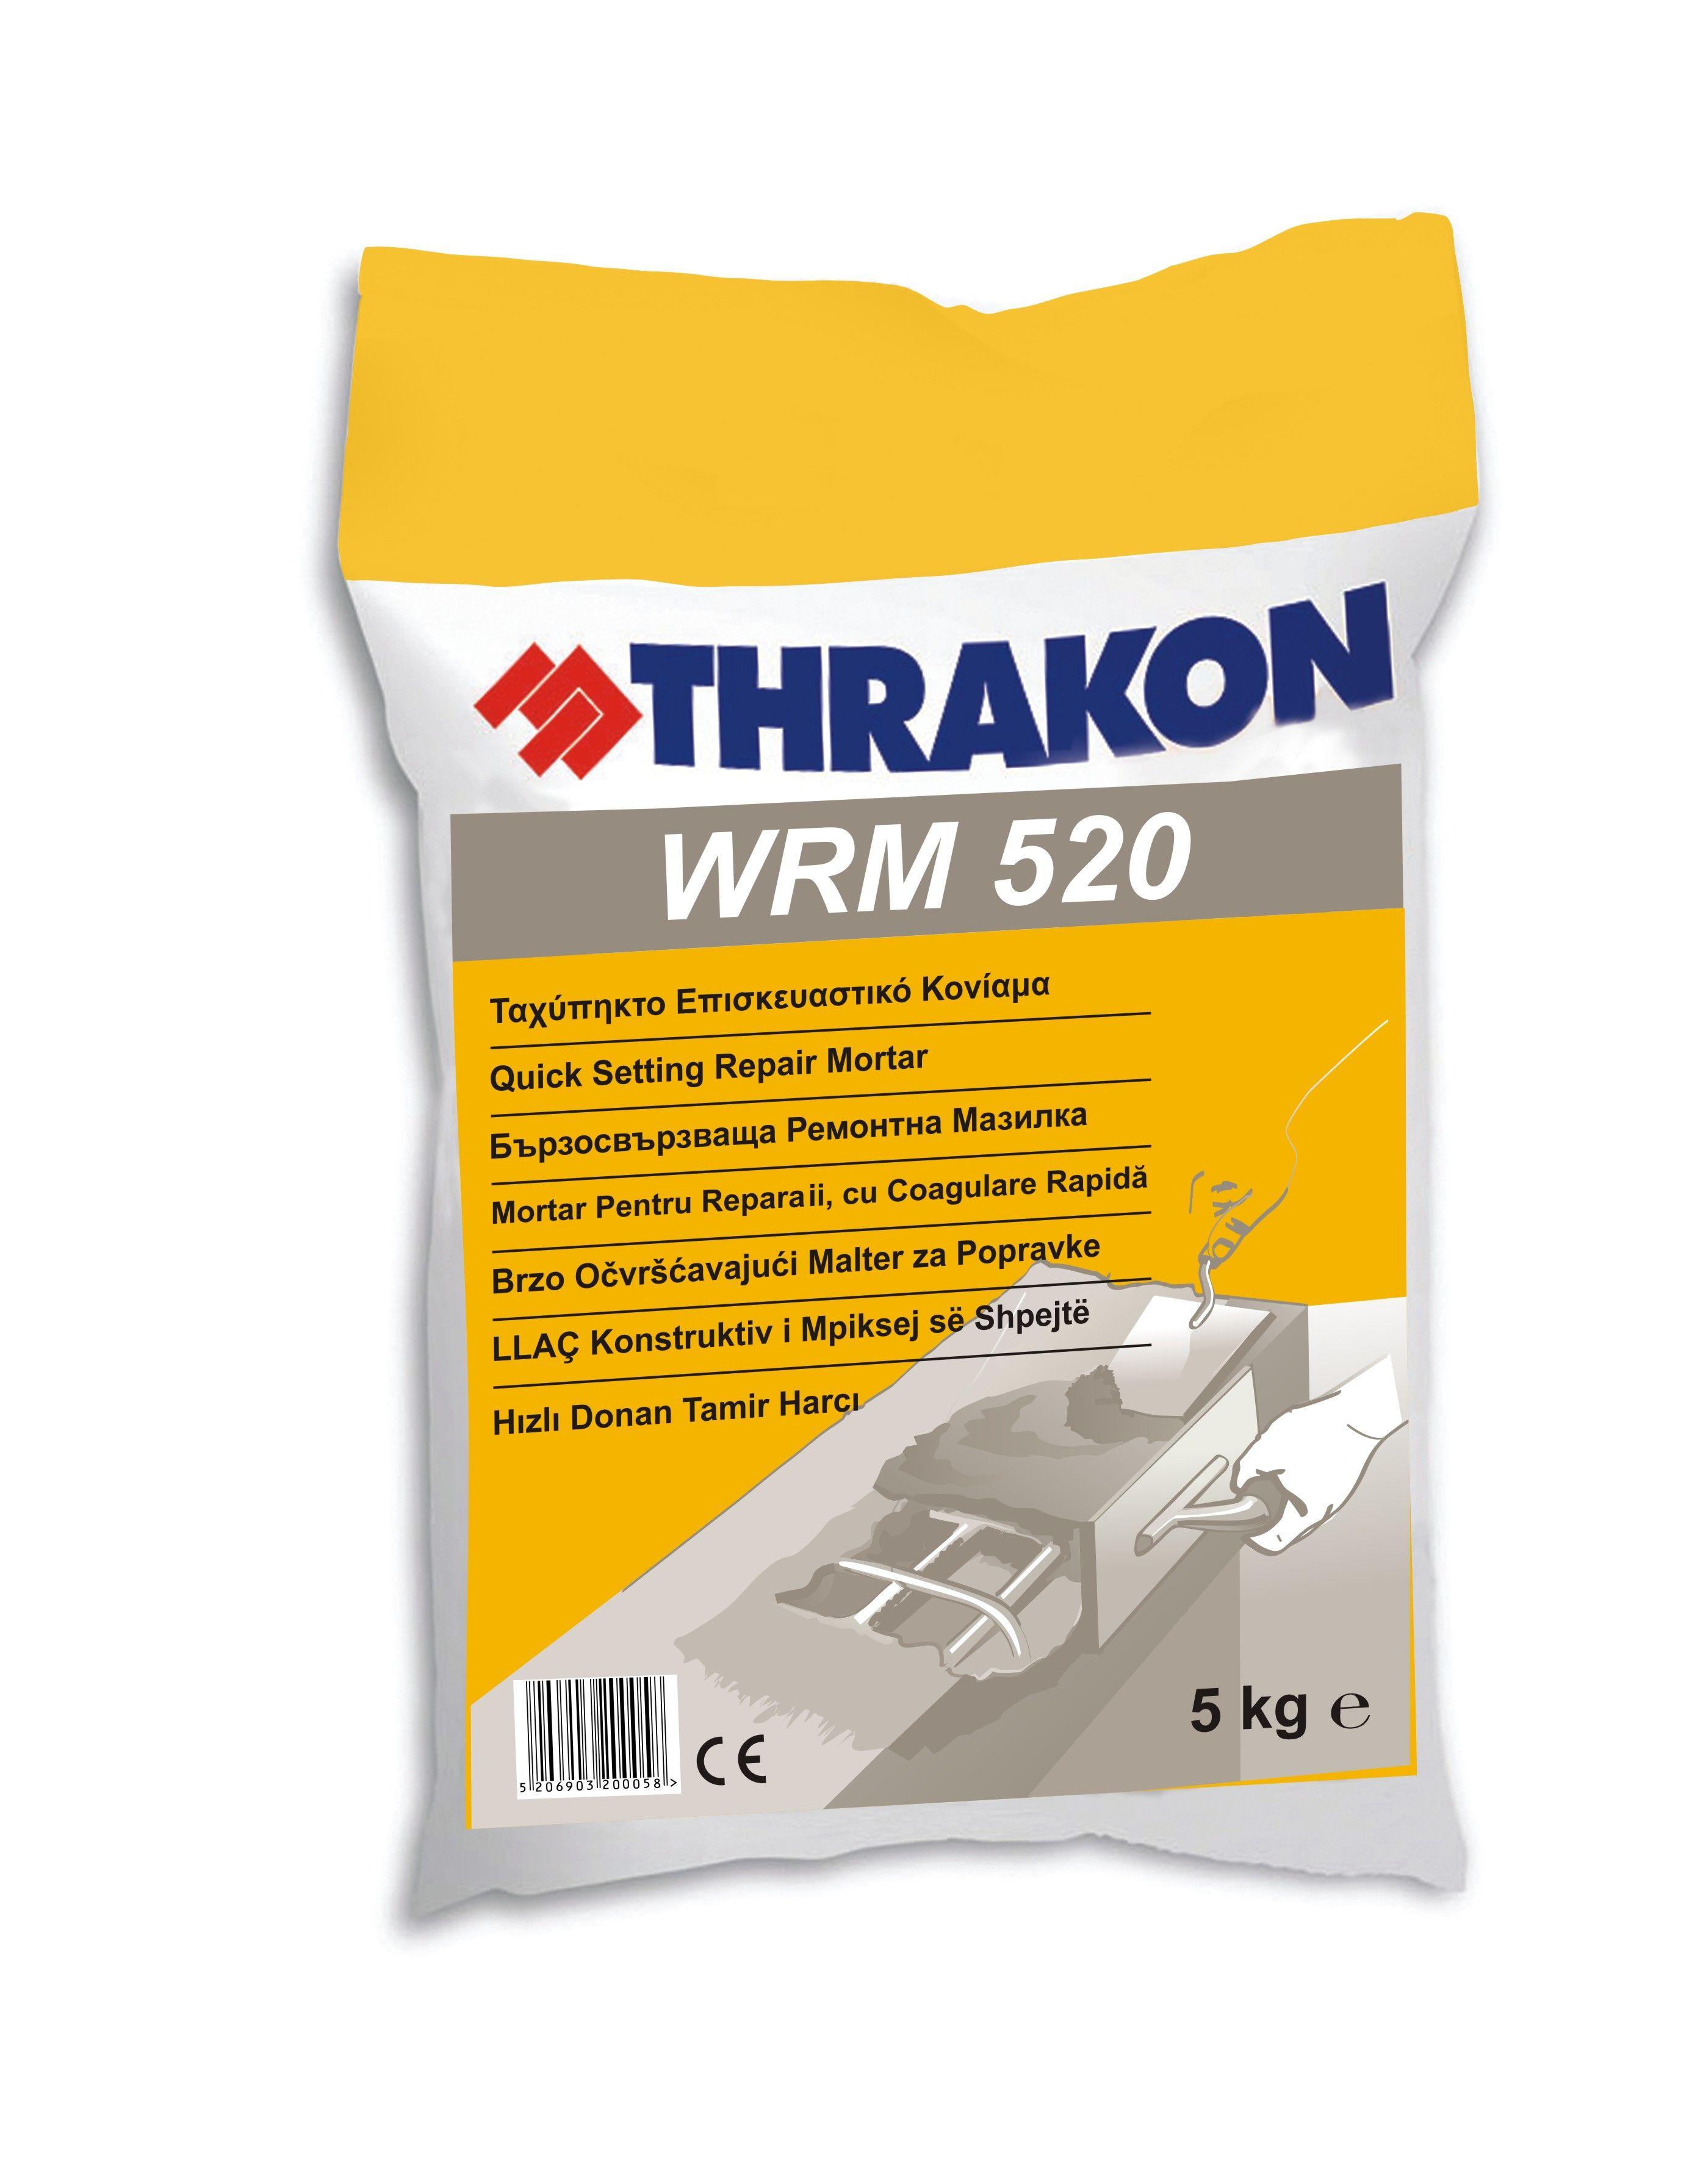 Thrakon WRM 520